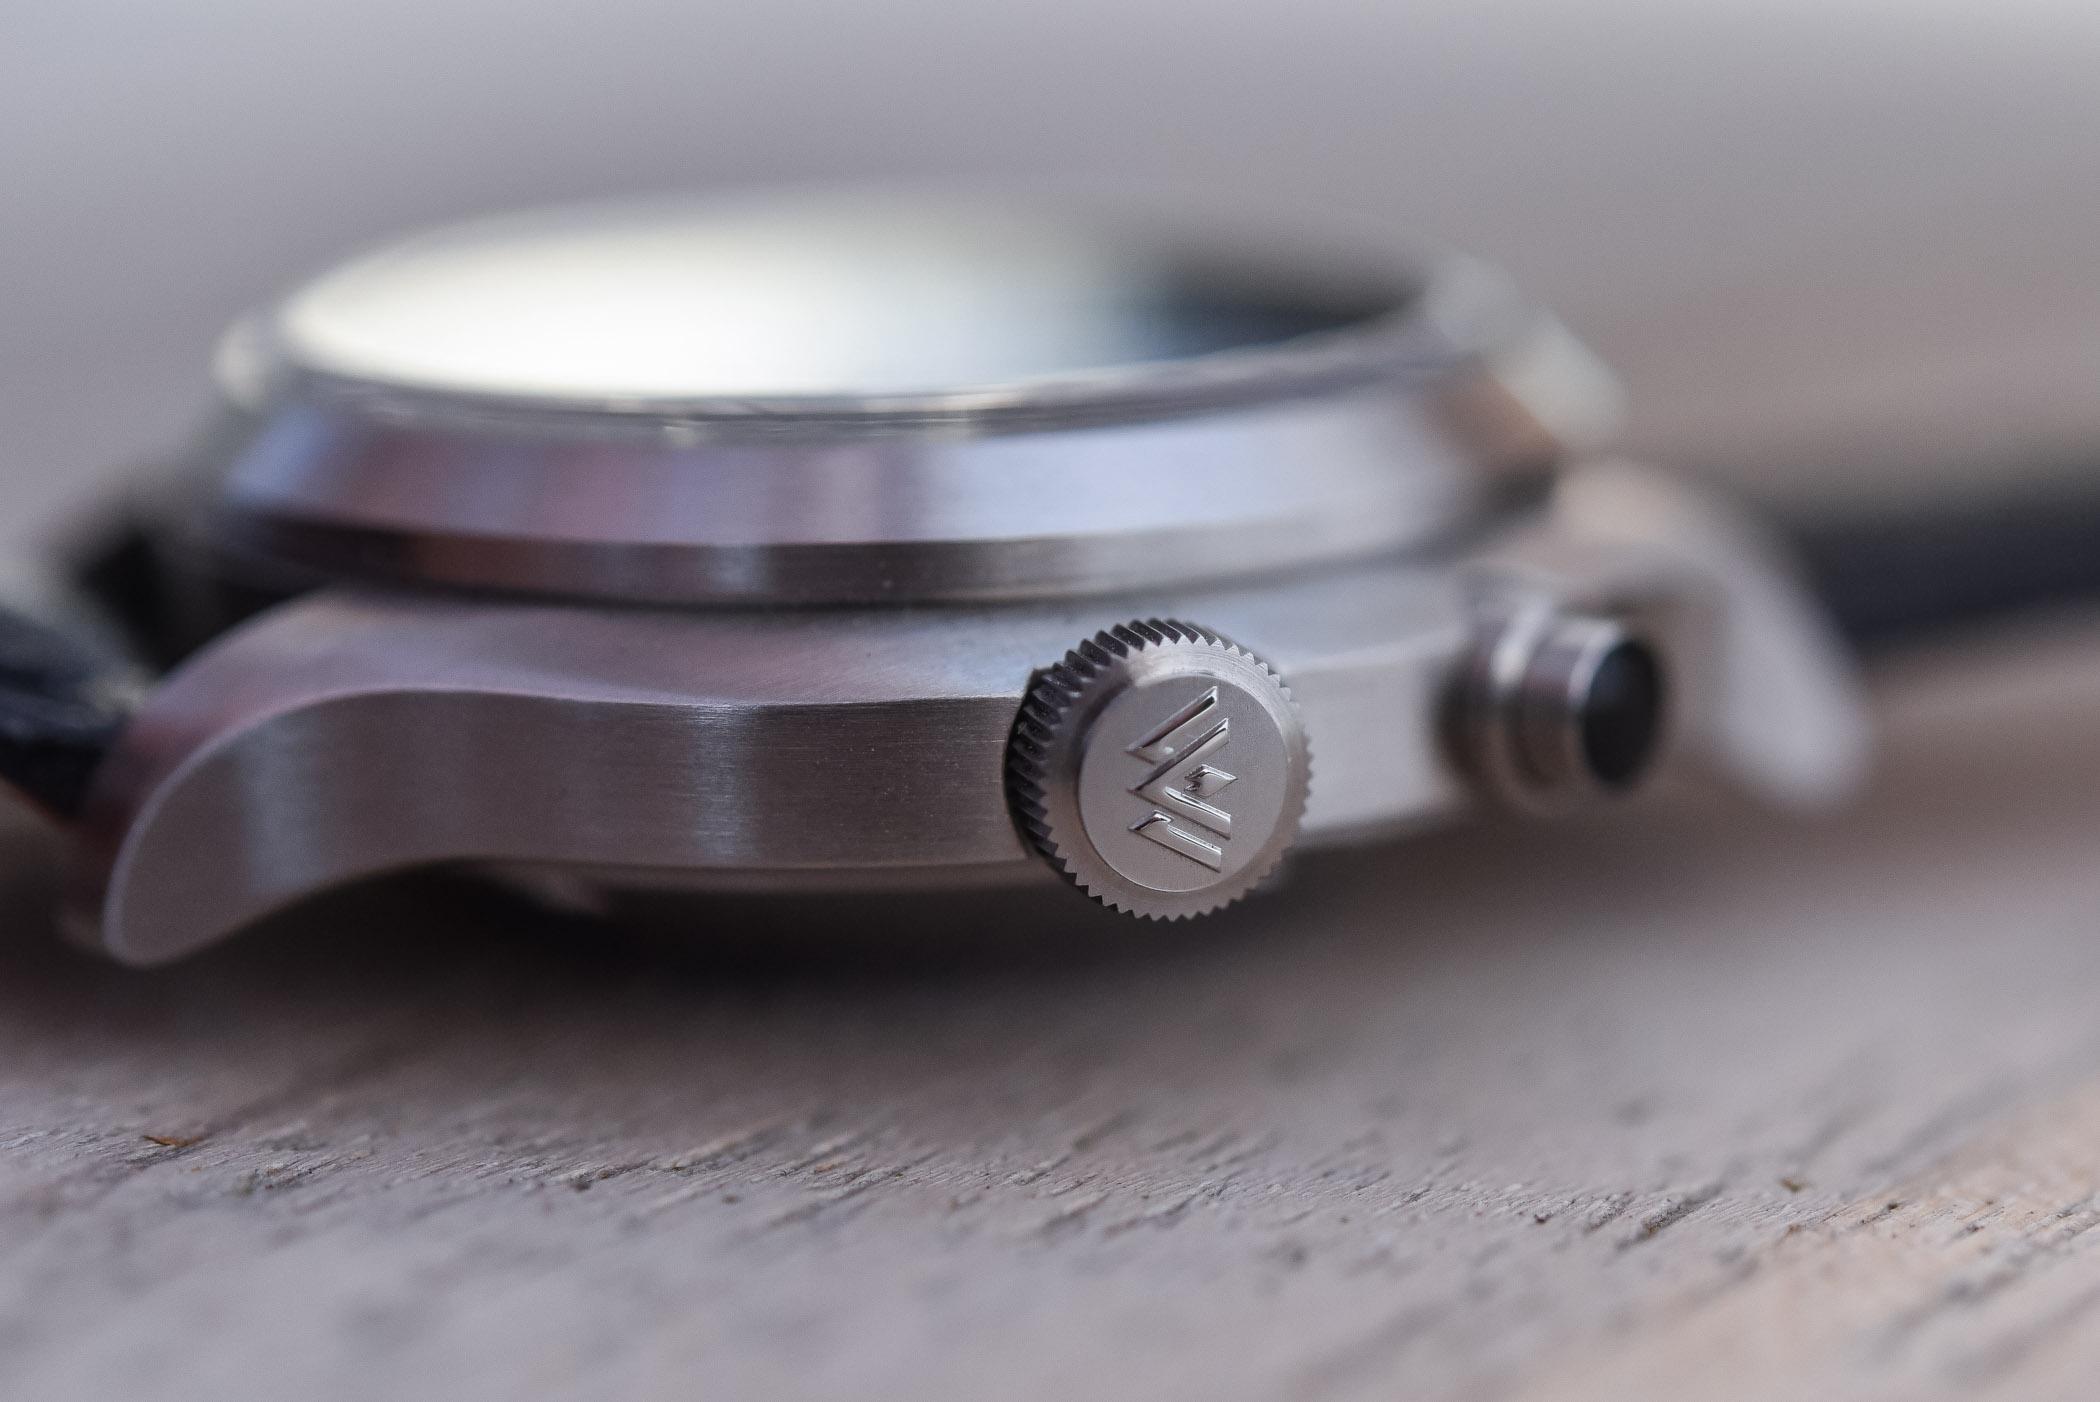 Vertex MP45 MonoPusher Chronograph Automatic - 7